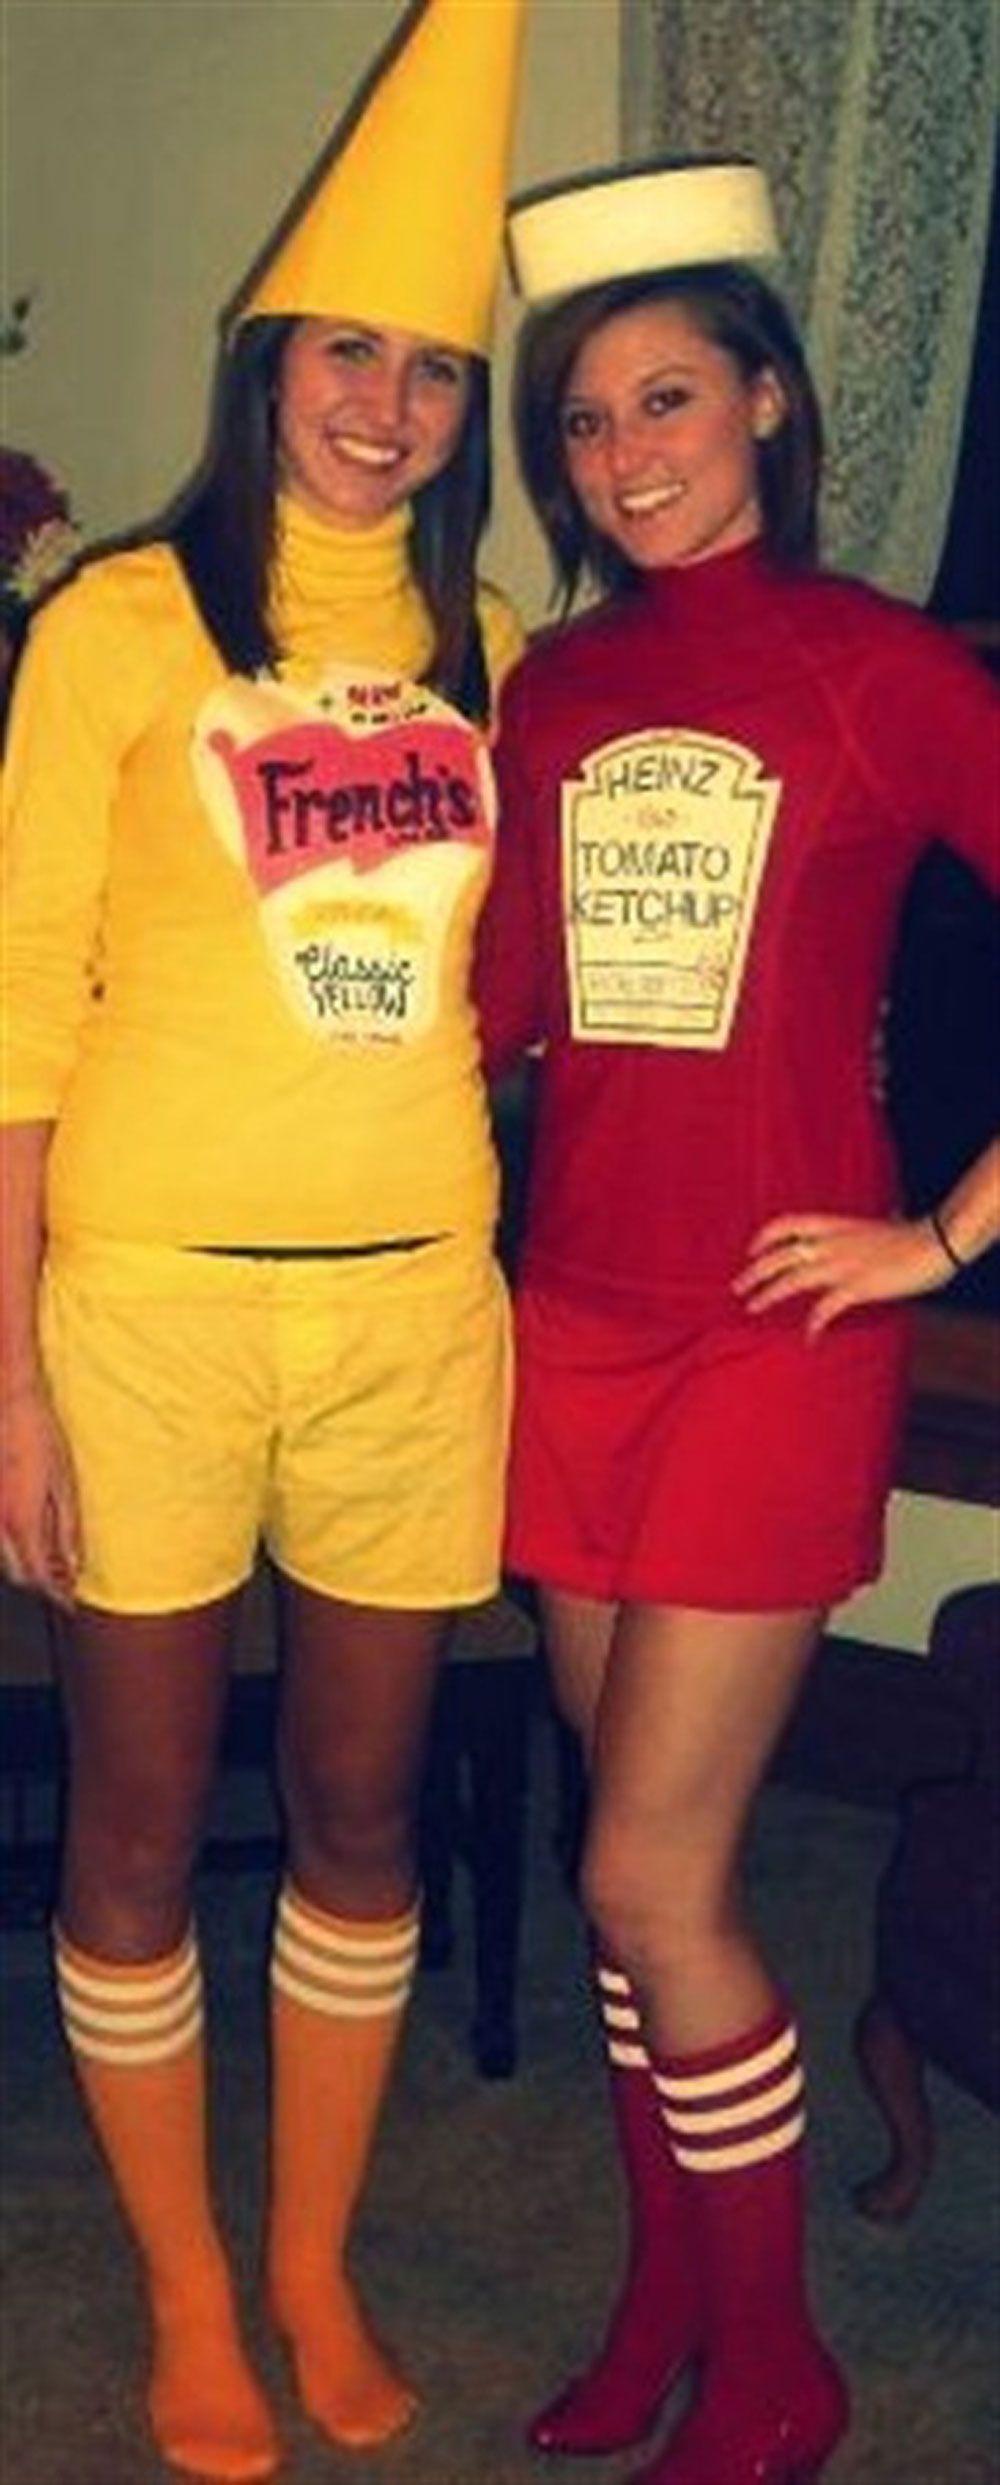 Friend Group Halloween Costumes Kids.32 Genius Bff Halloween Costume Ideas You And Your Bestie